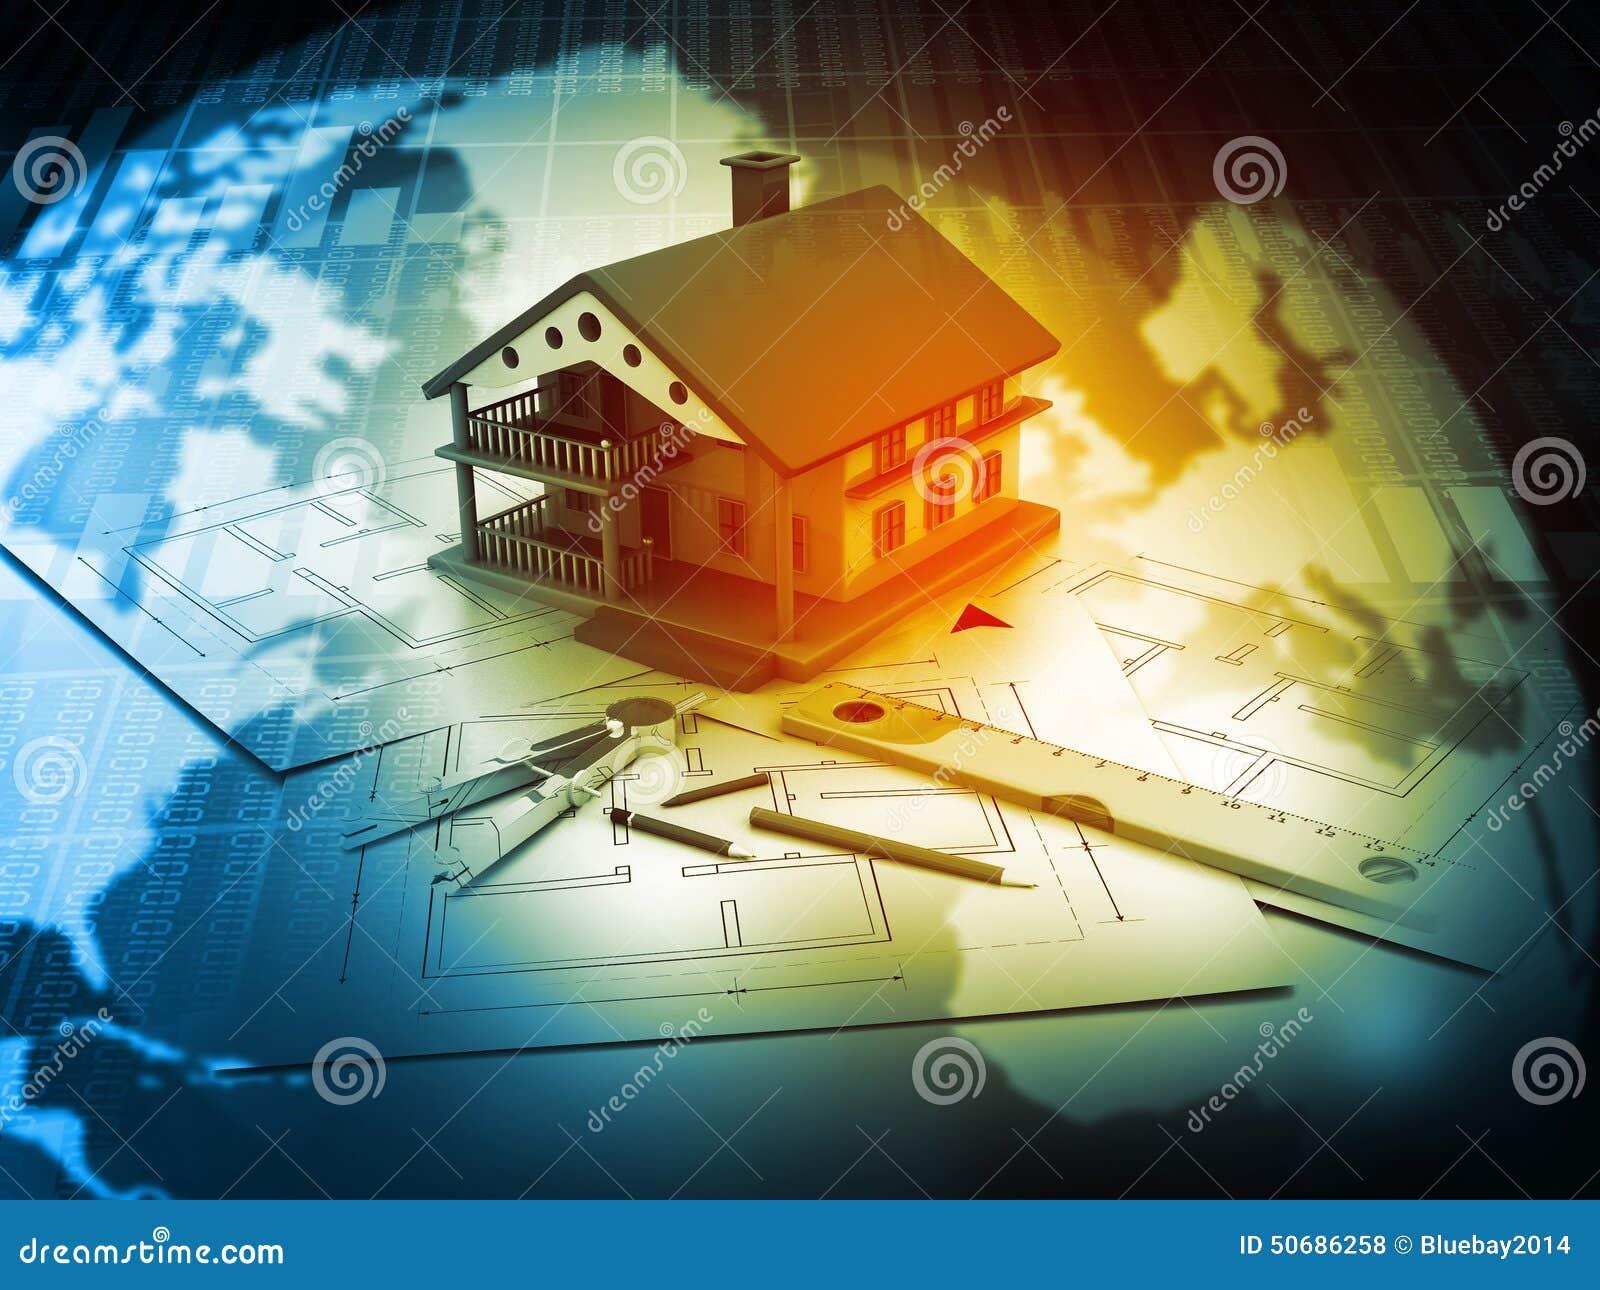 Download 3d计划图纸的房子 库存例证. 插画 包括有 例证, 全球, 设计, 抽象, 结构, 背包, 想法, 图画 - 50686258